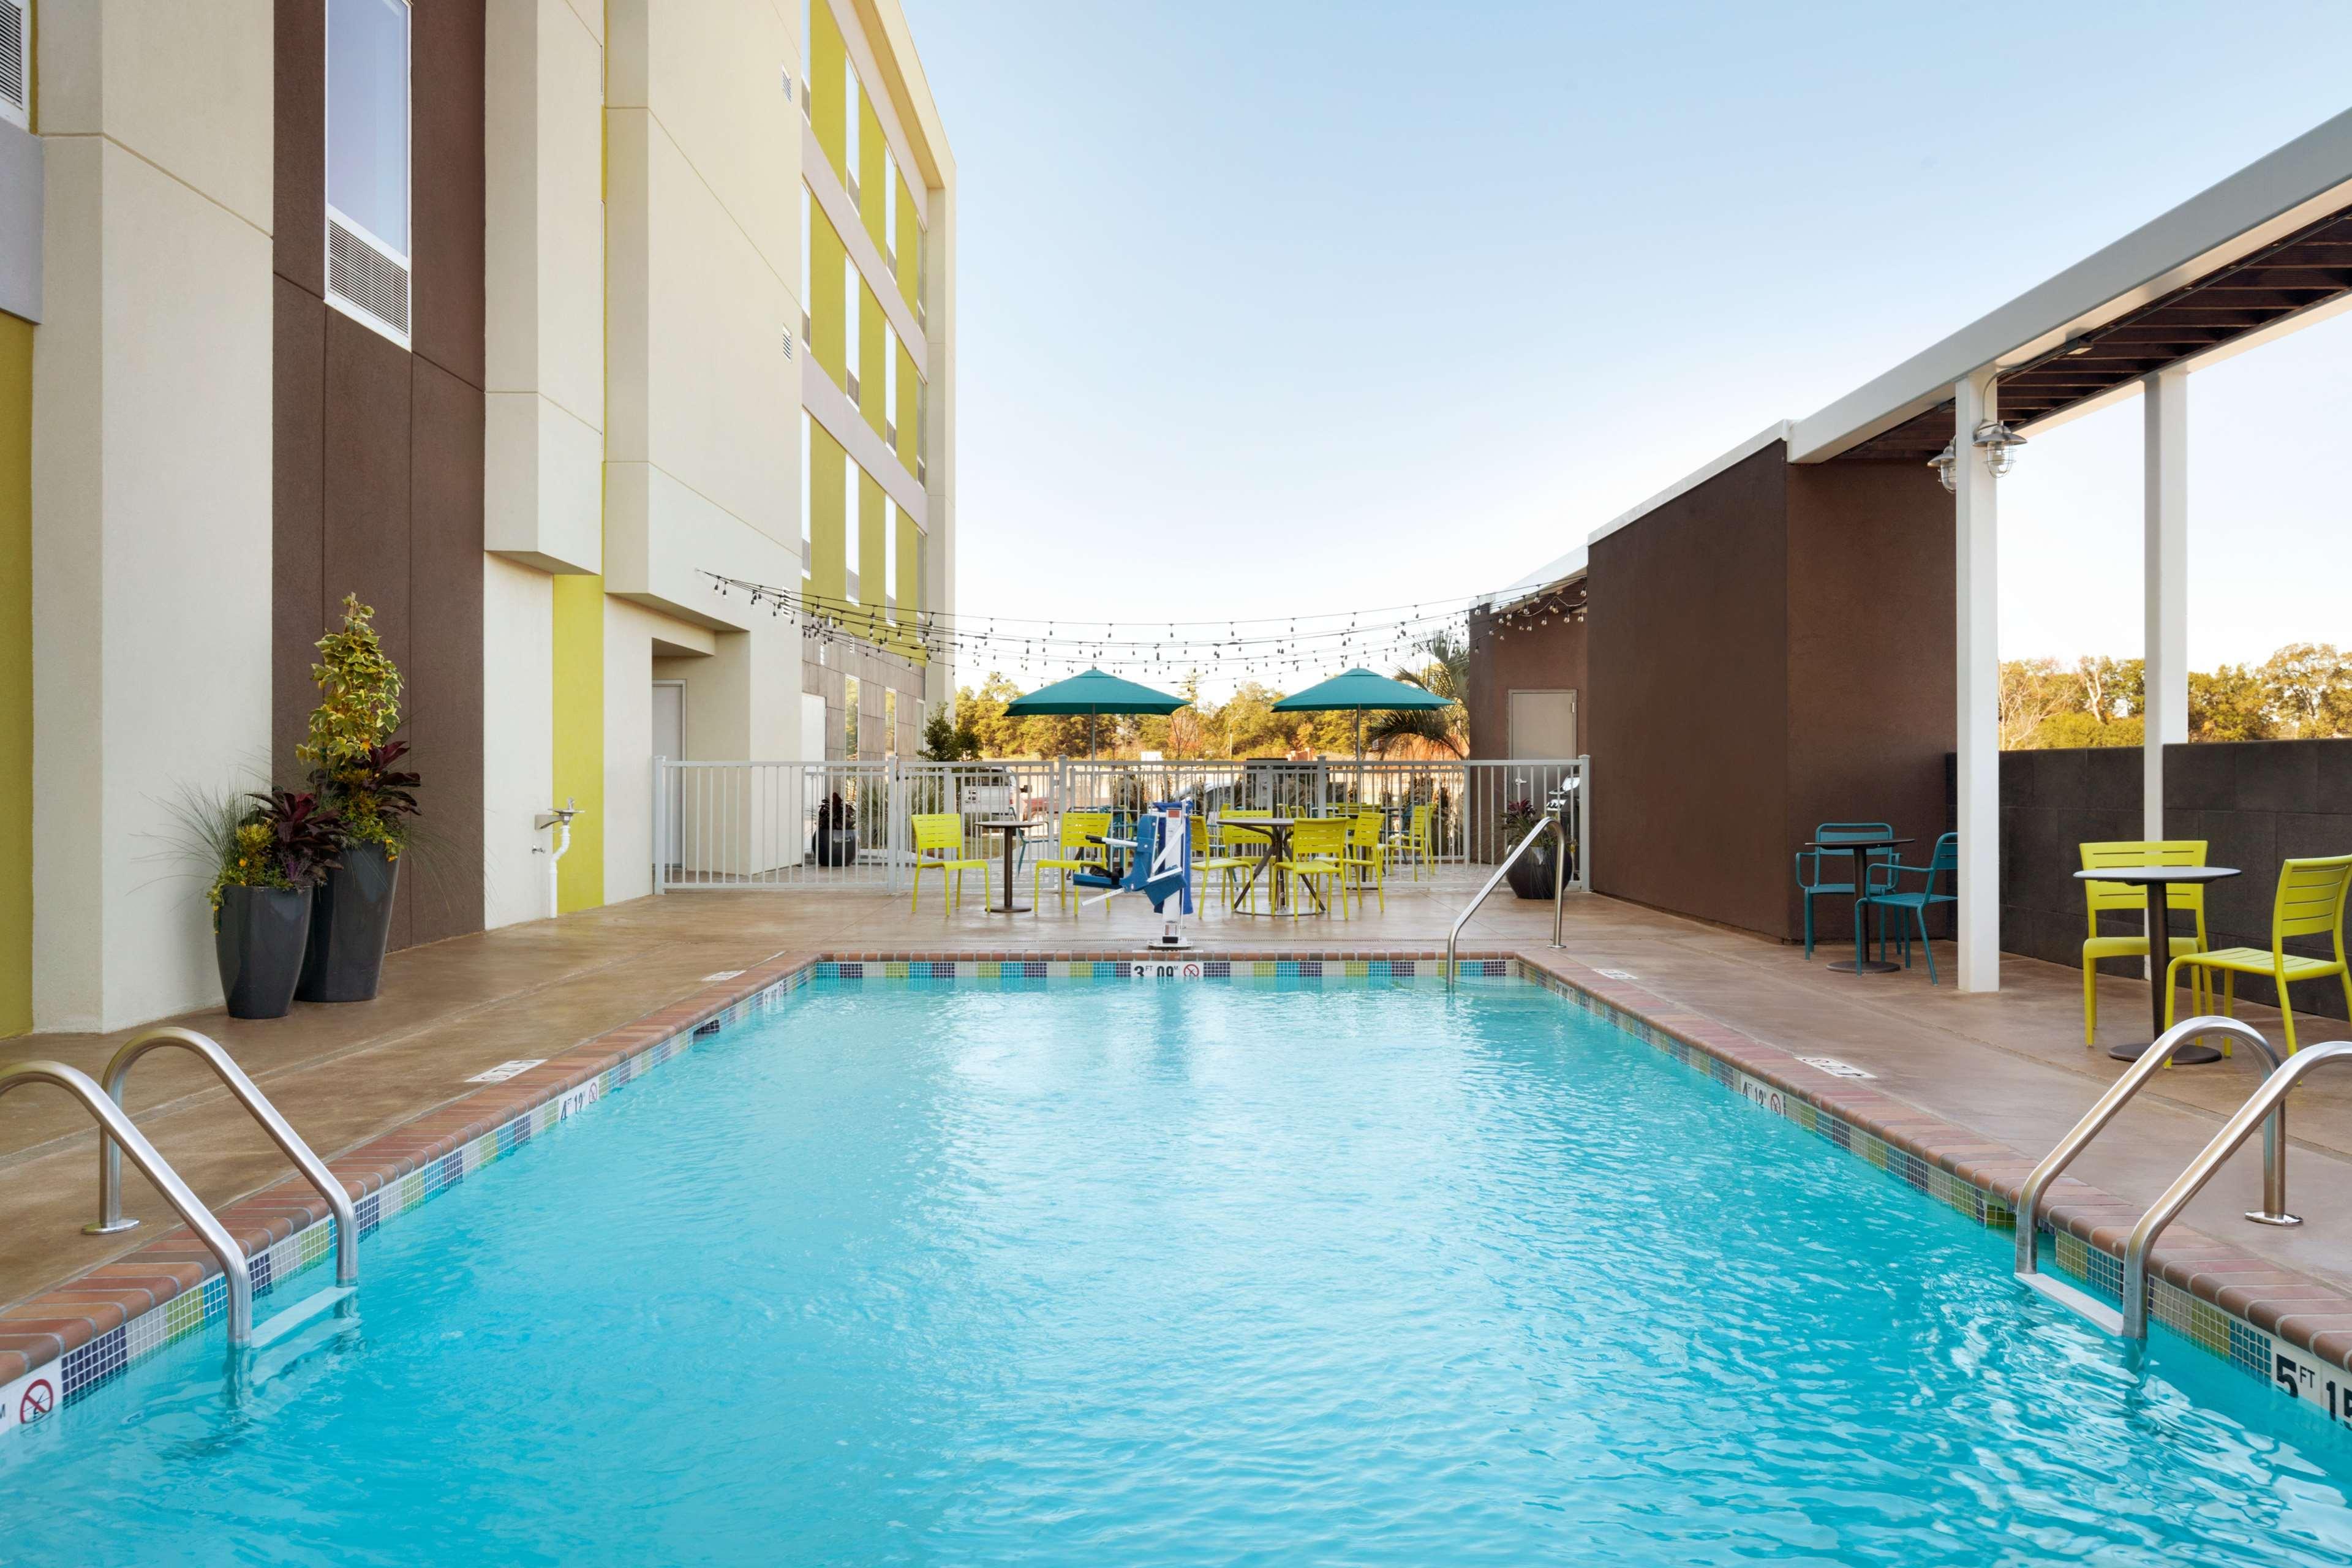 Home2 Suites by Hilton West Monroe image 5